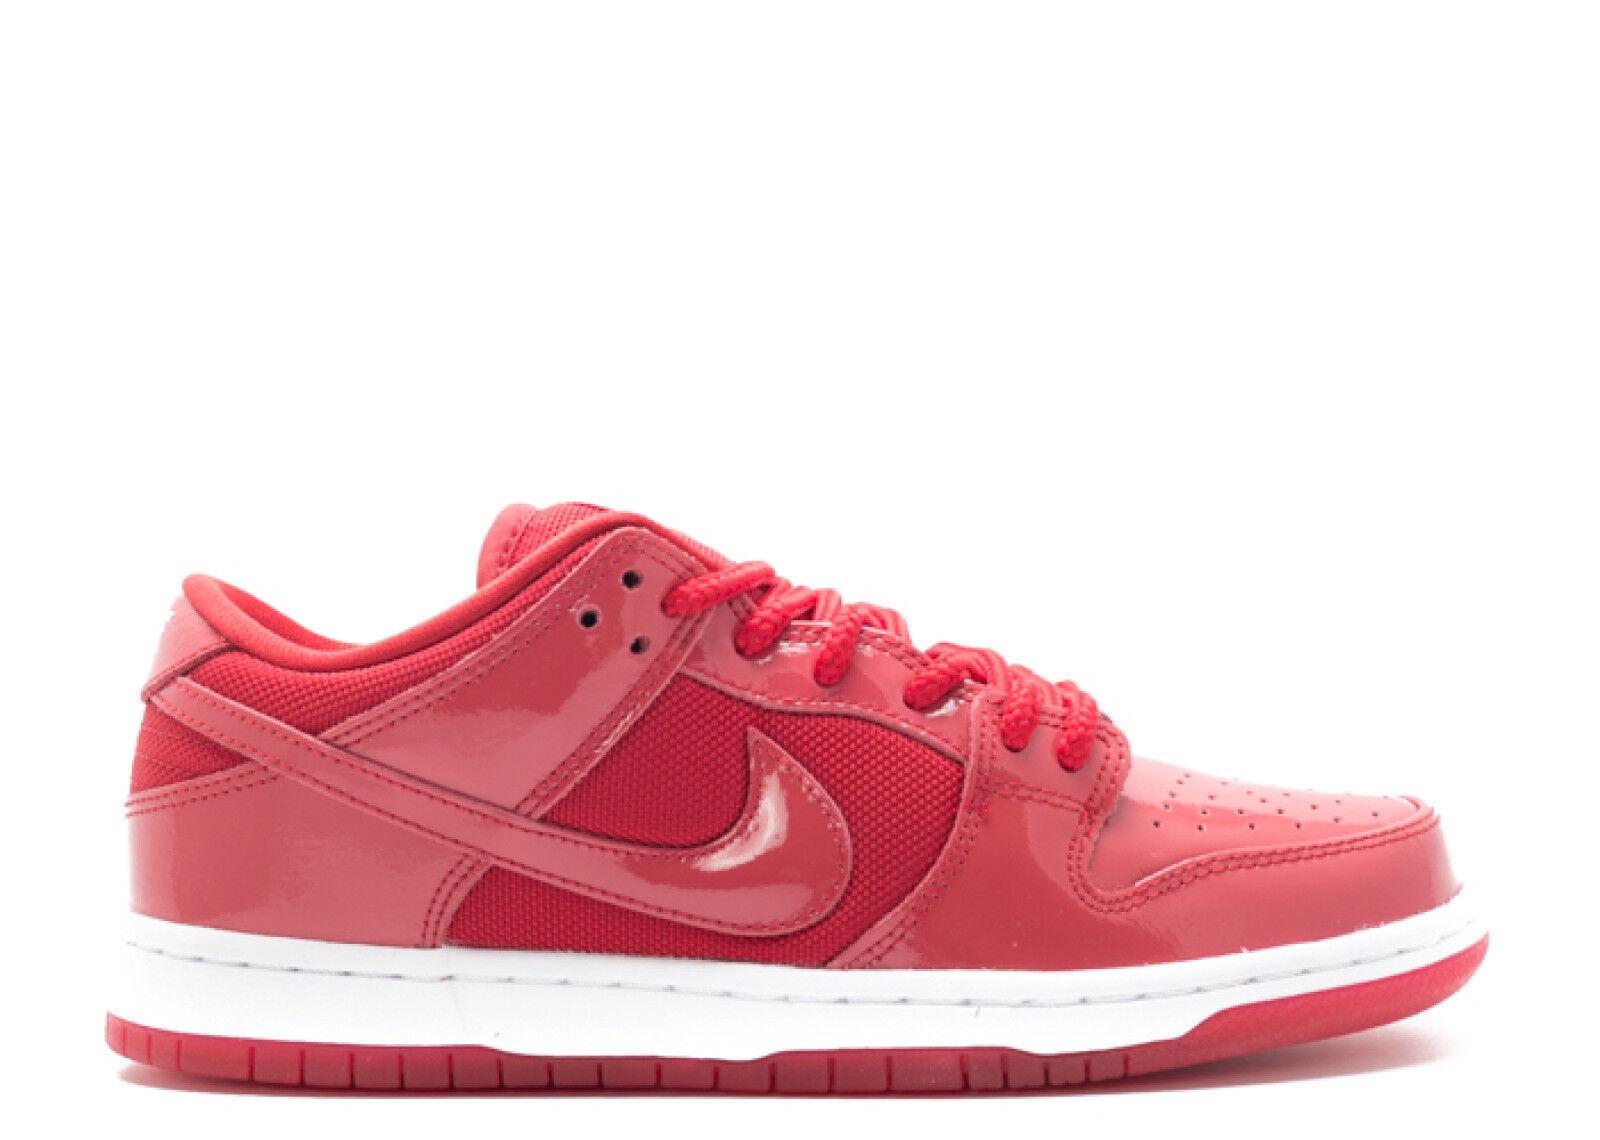 Nike e basso (sb squadra rosso (525), - bianco - 304292-616 (525), rosso scarpe da uomo b3fbcd